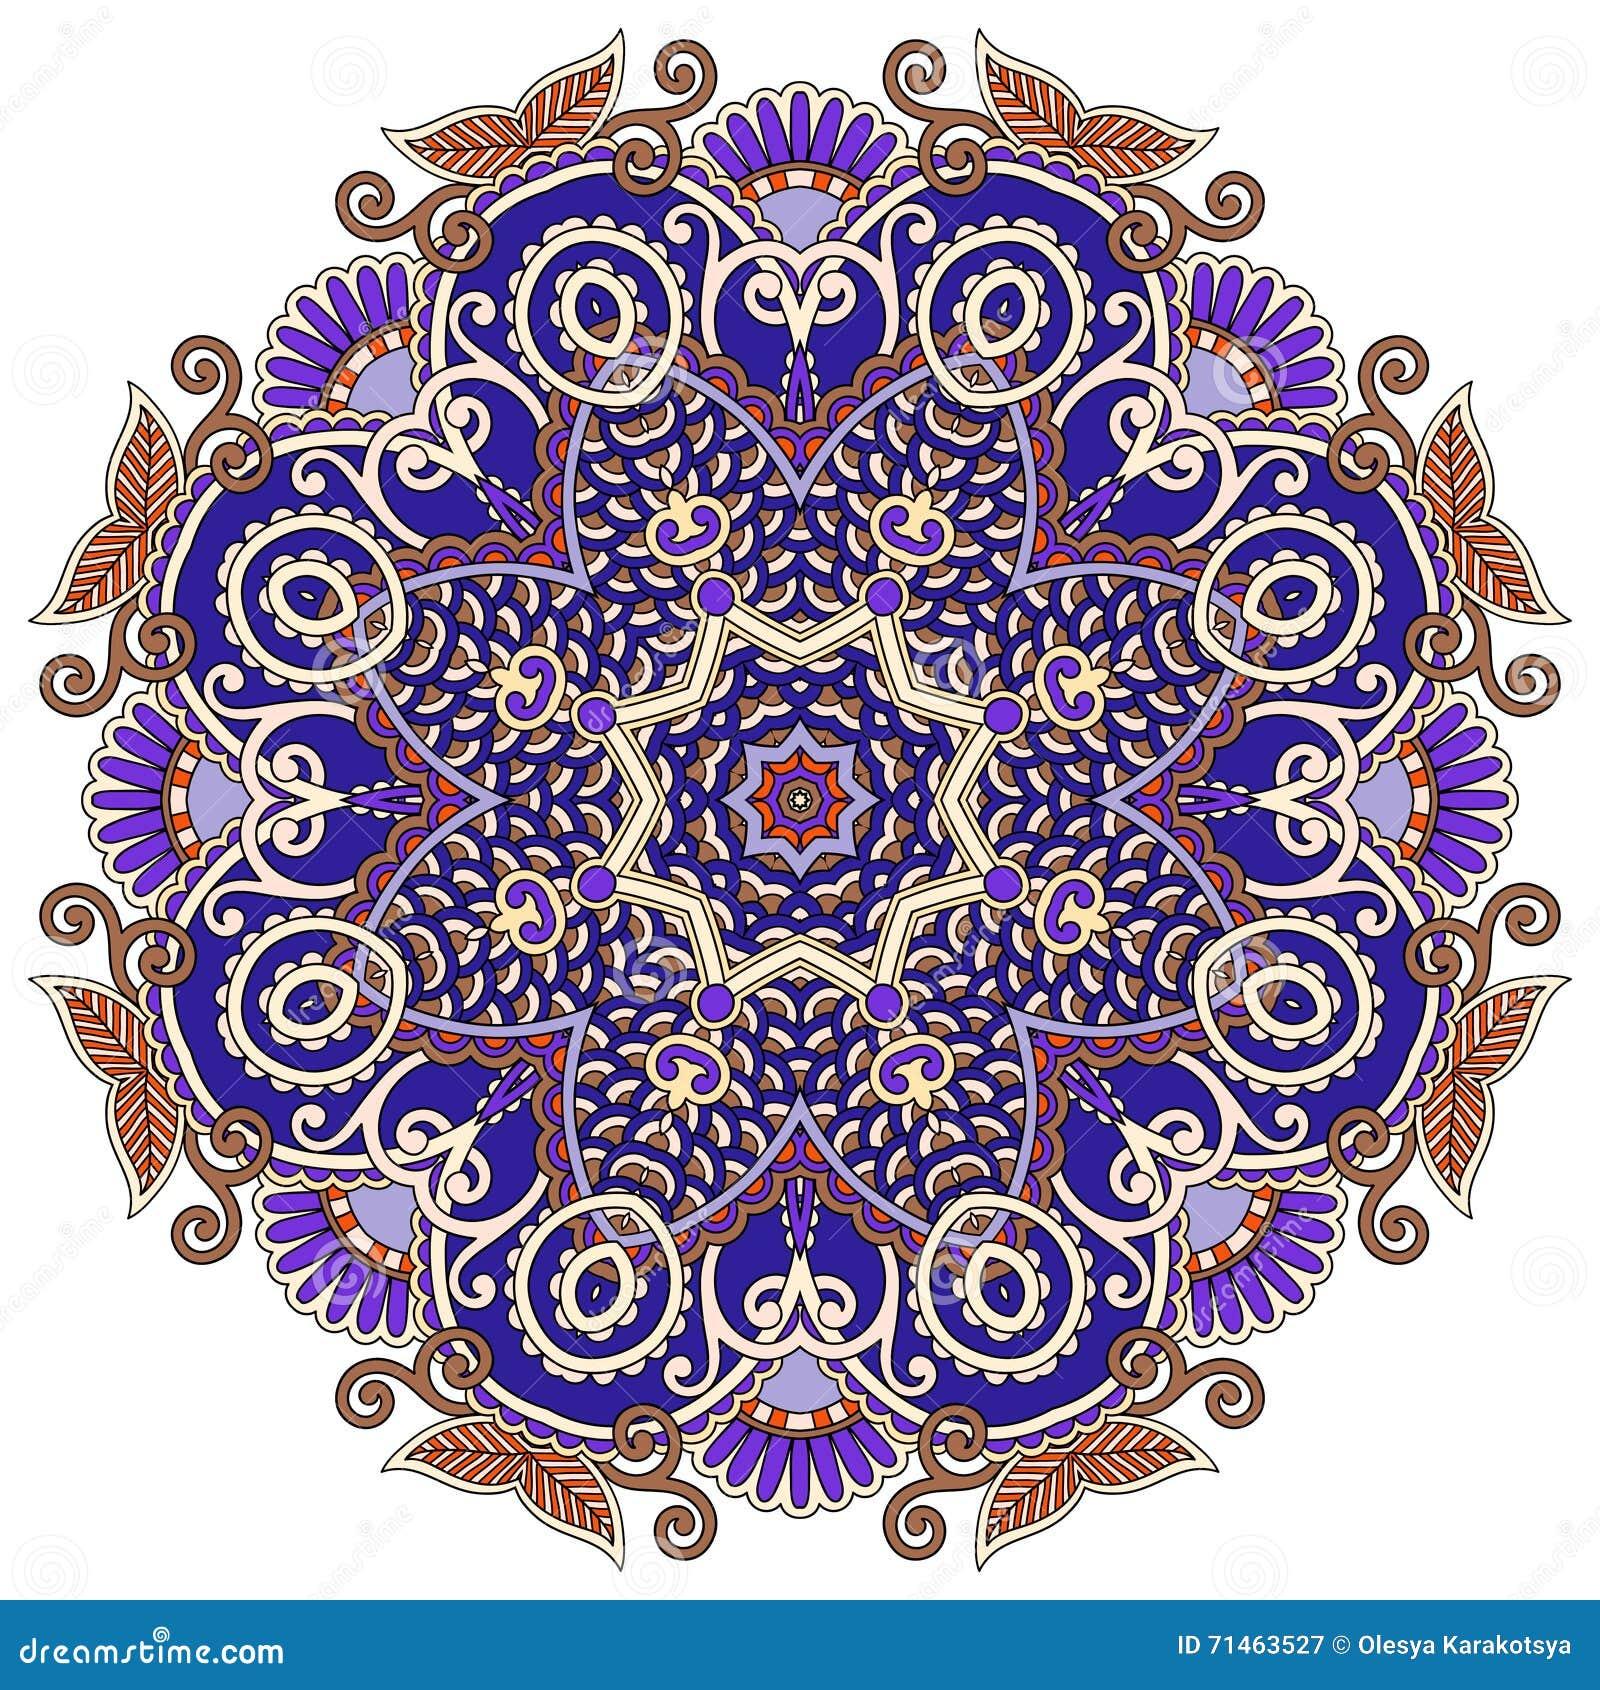 Hindu mandala lotus flower pattern stock vector image 54951841 mandala circle decorative spiritual indian symbol of lotus flow royalty free stock photography dhlflorist Gallery